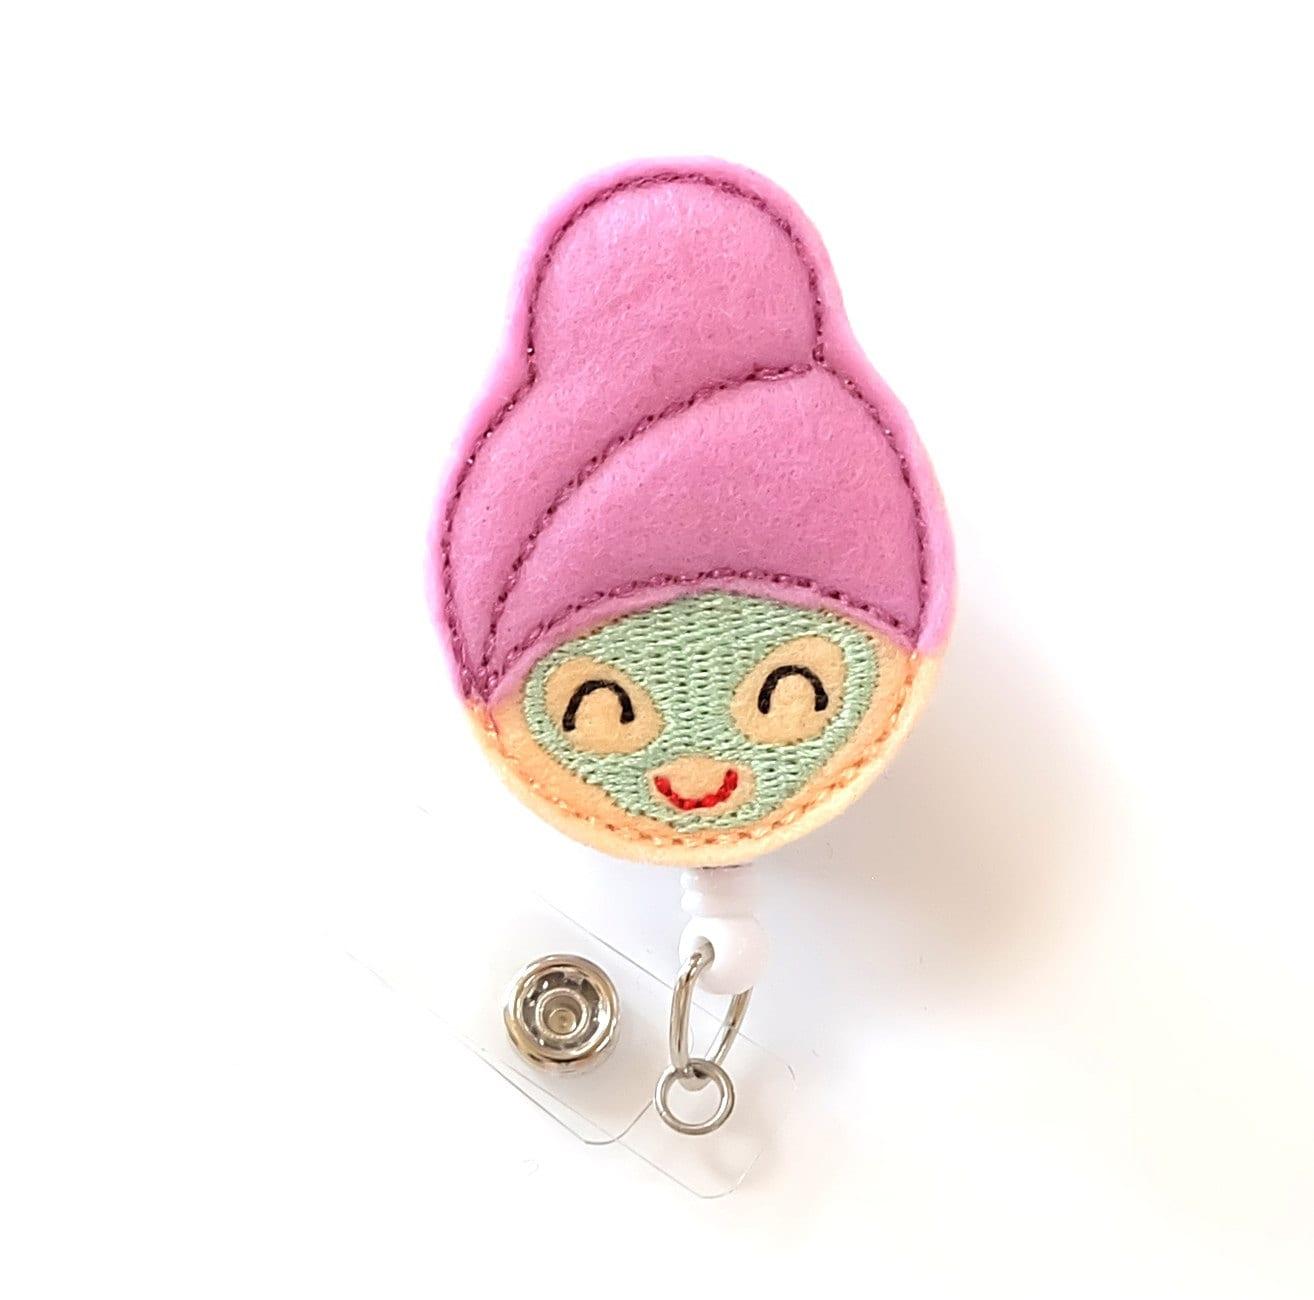 Design t shirt esthetician - Spa Girl Day Spa Staff Badge Holder Cute Badge Reel Esthetician Gifts